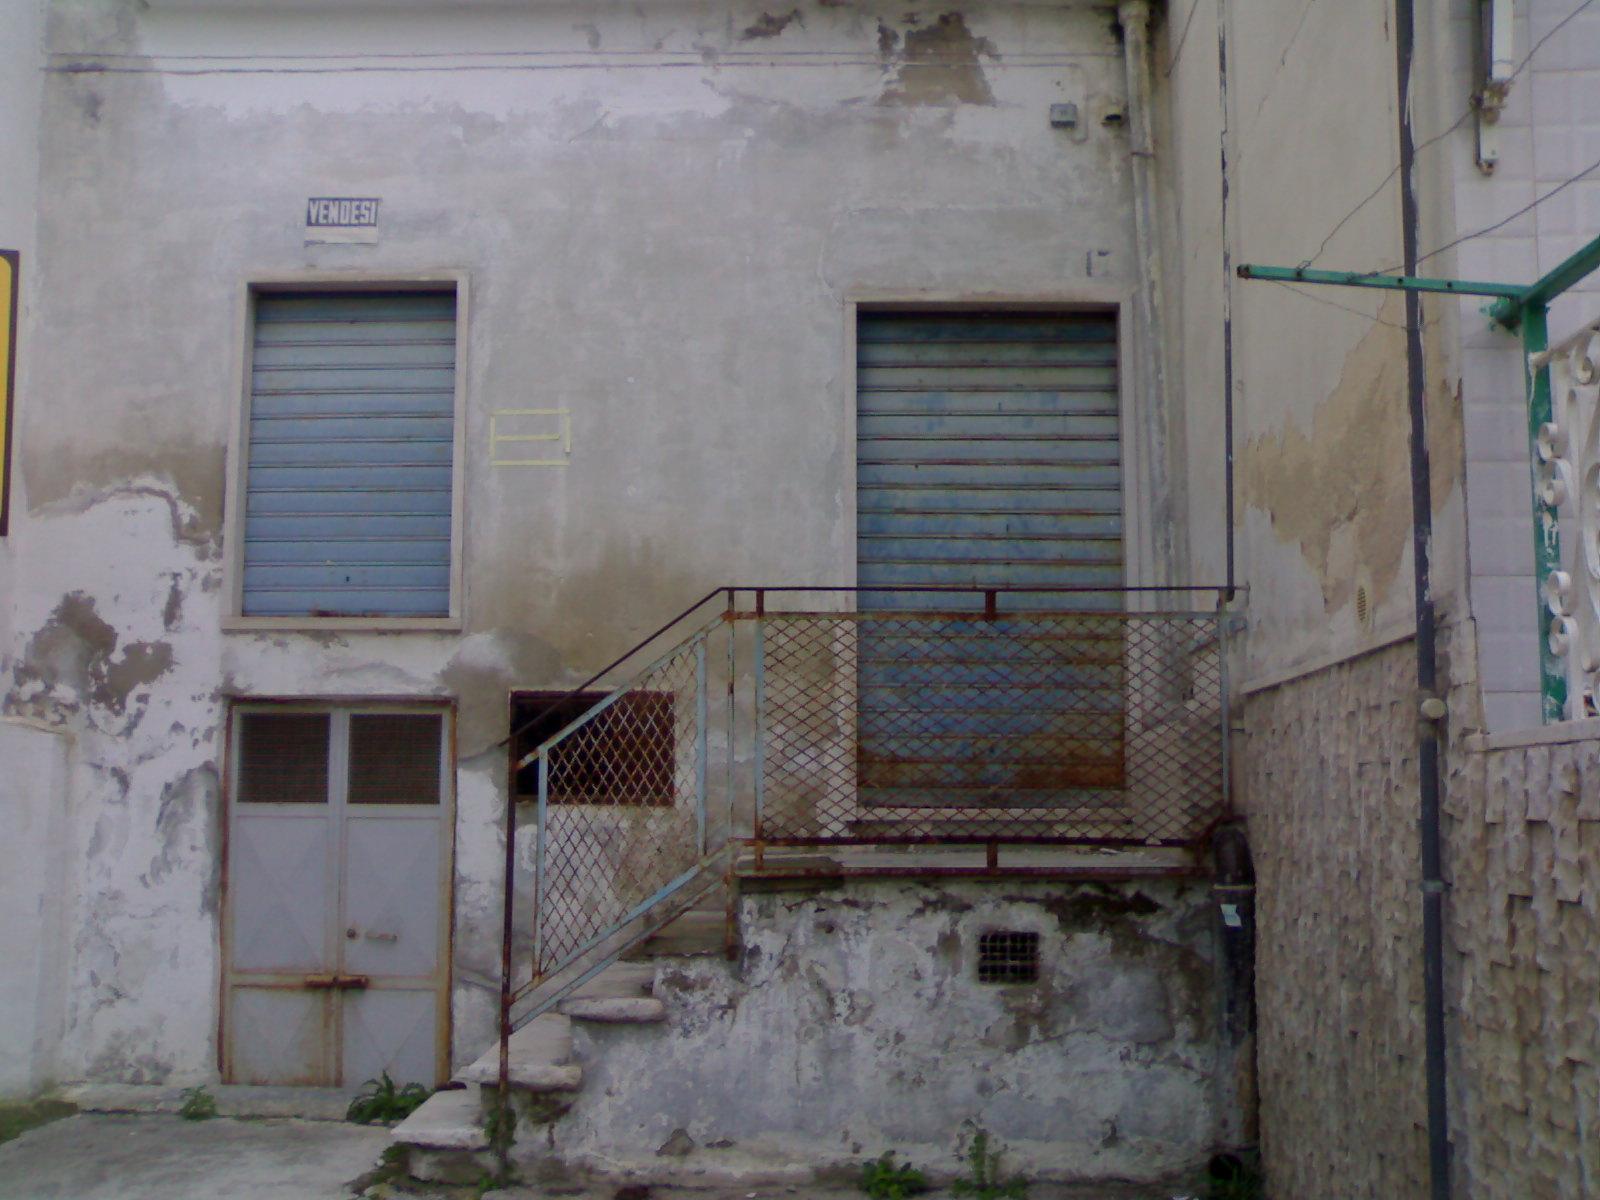 Casa singola in vendita a canosa di puglia cod r200 - Piano casa regione puglia ...